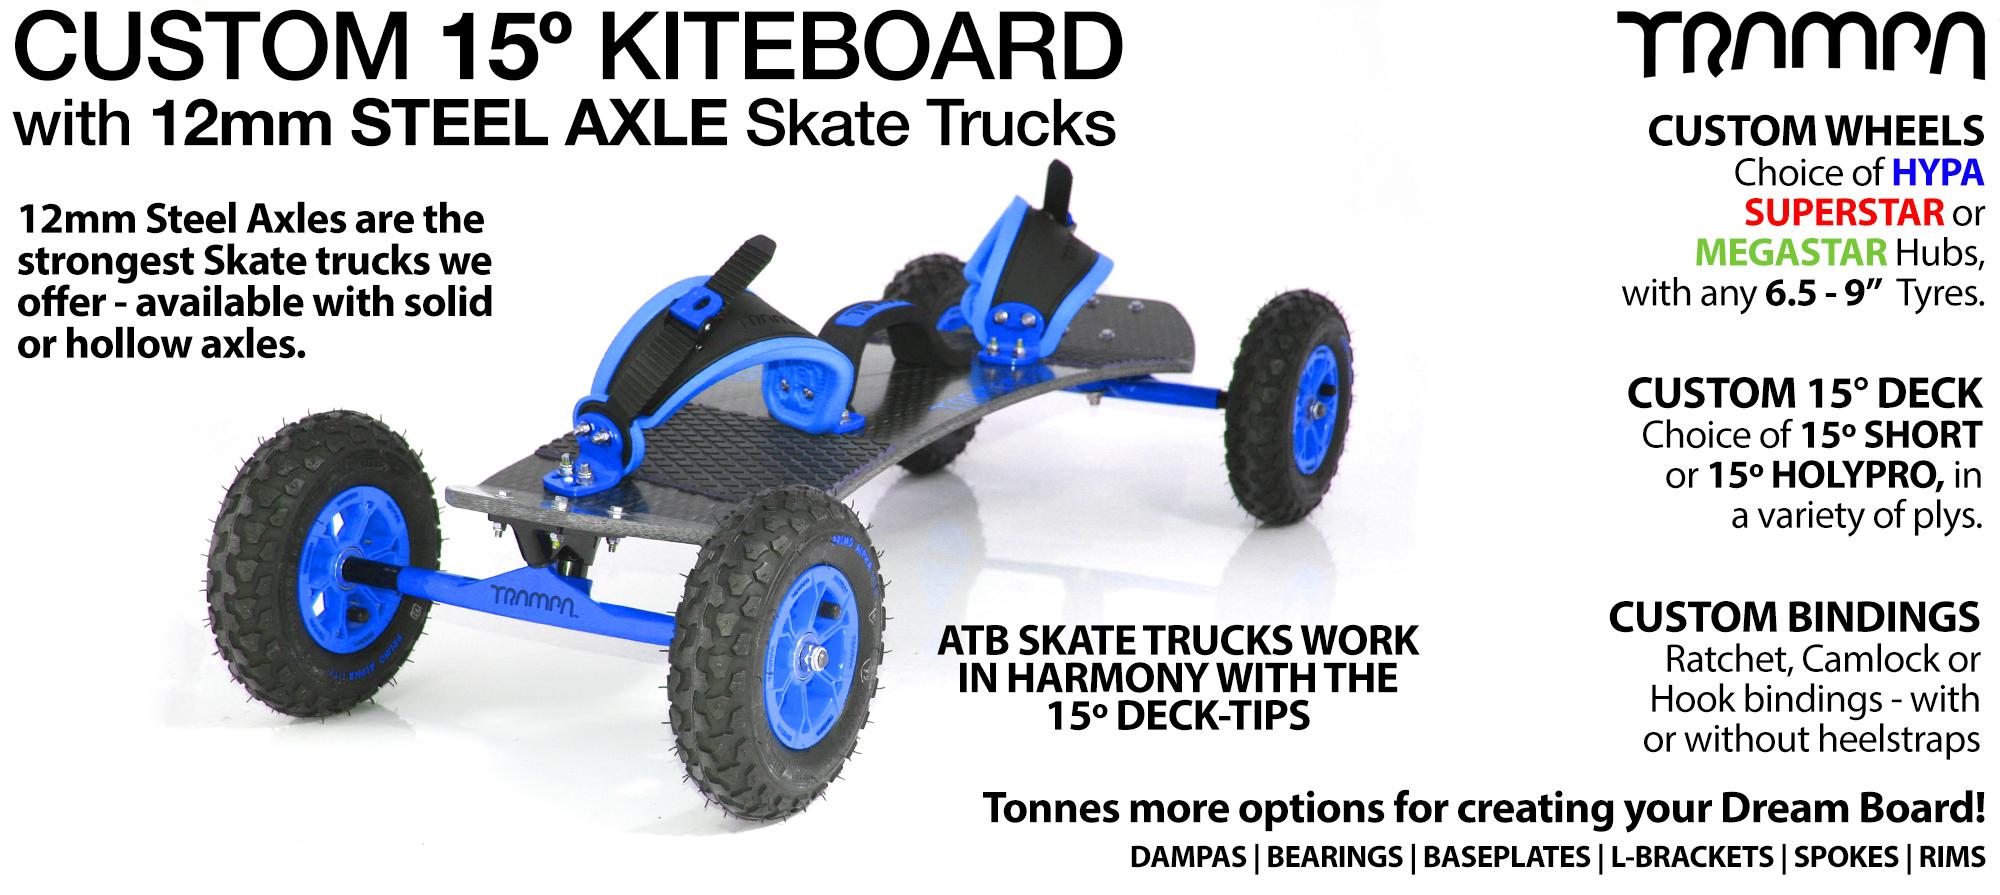 TRAMPA Kiteboard - 12mm Axle Skate Trucks